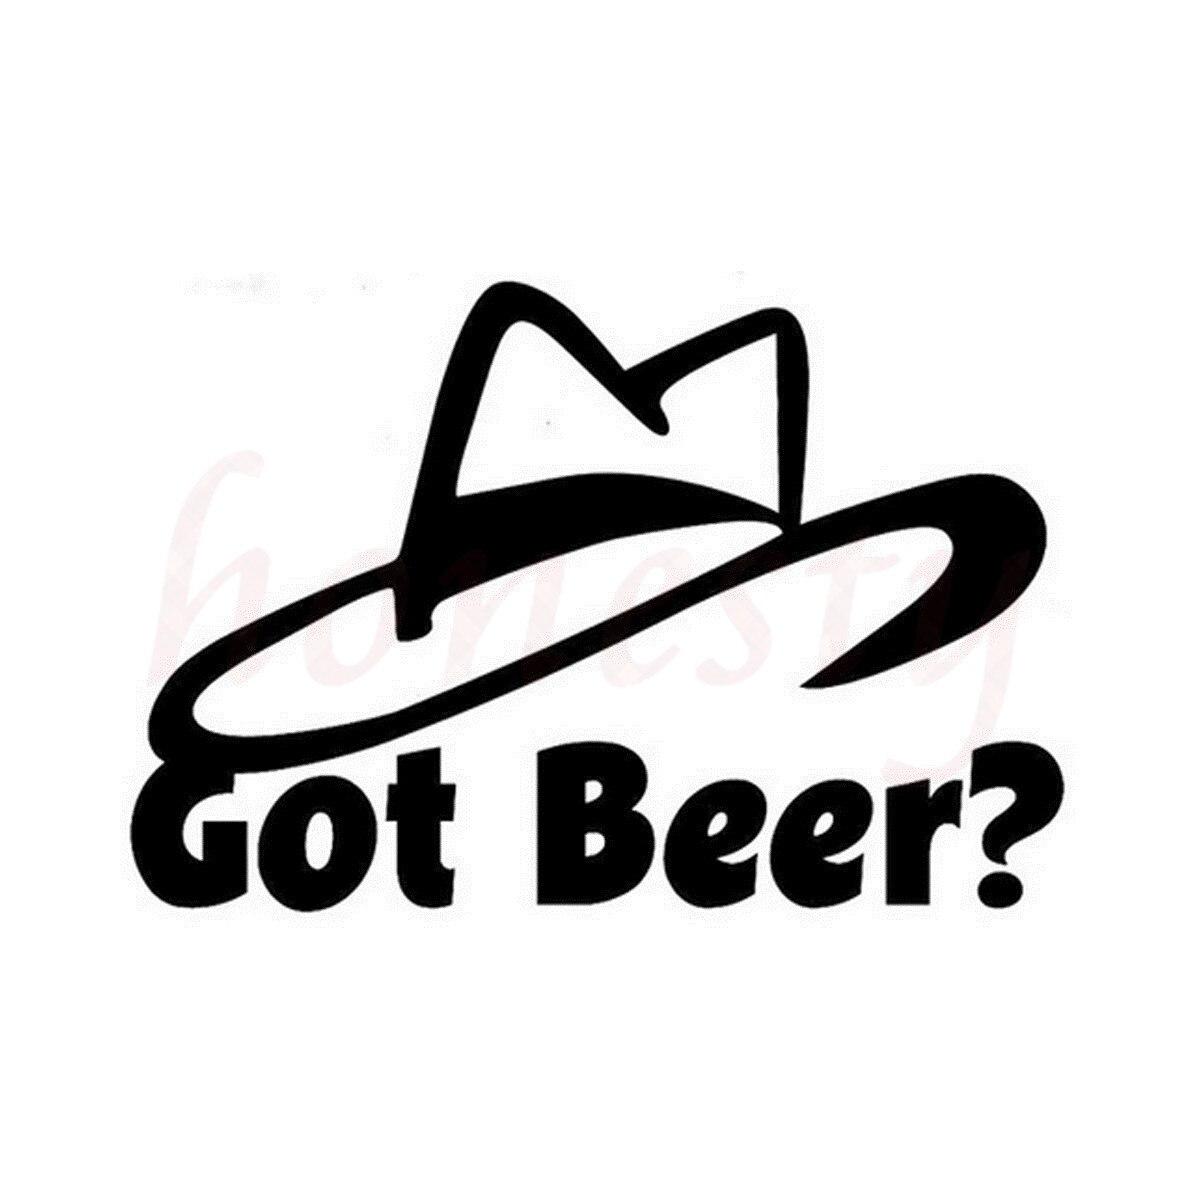 Got Beer Booze Hat Car Auto Wall Home Glass Window Door Vinyl Decal Sticker Car Accessories Car